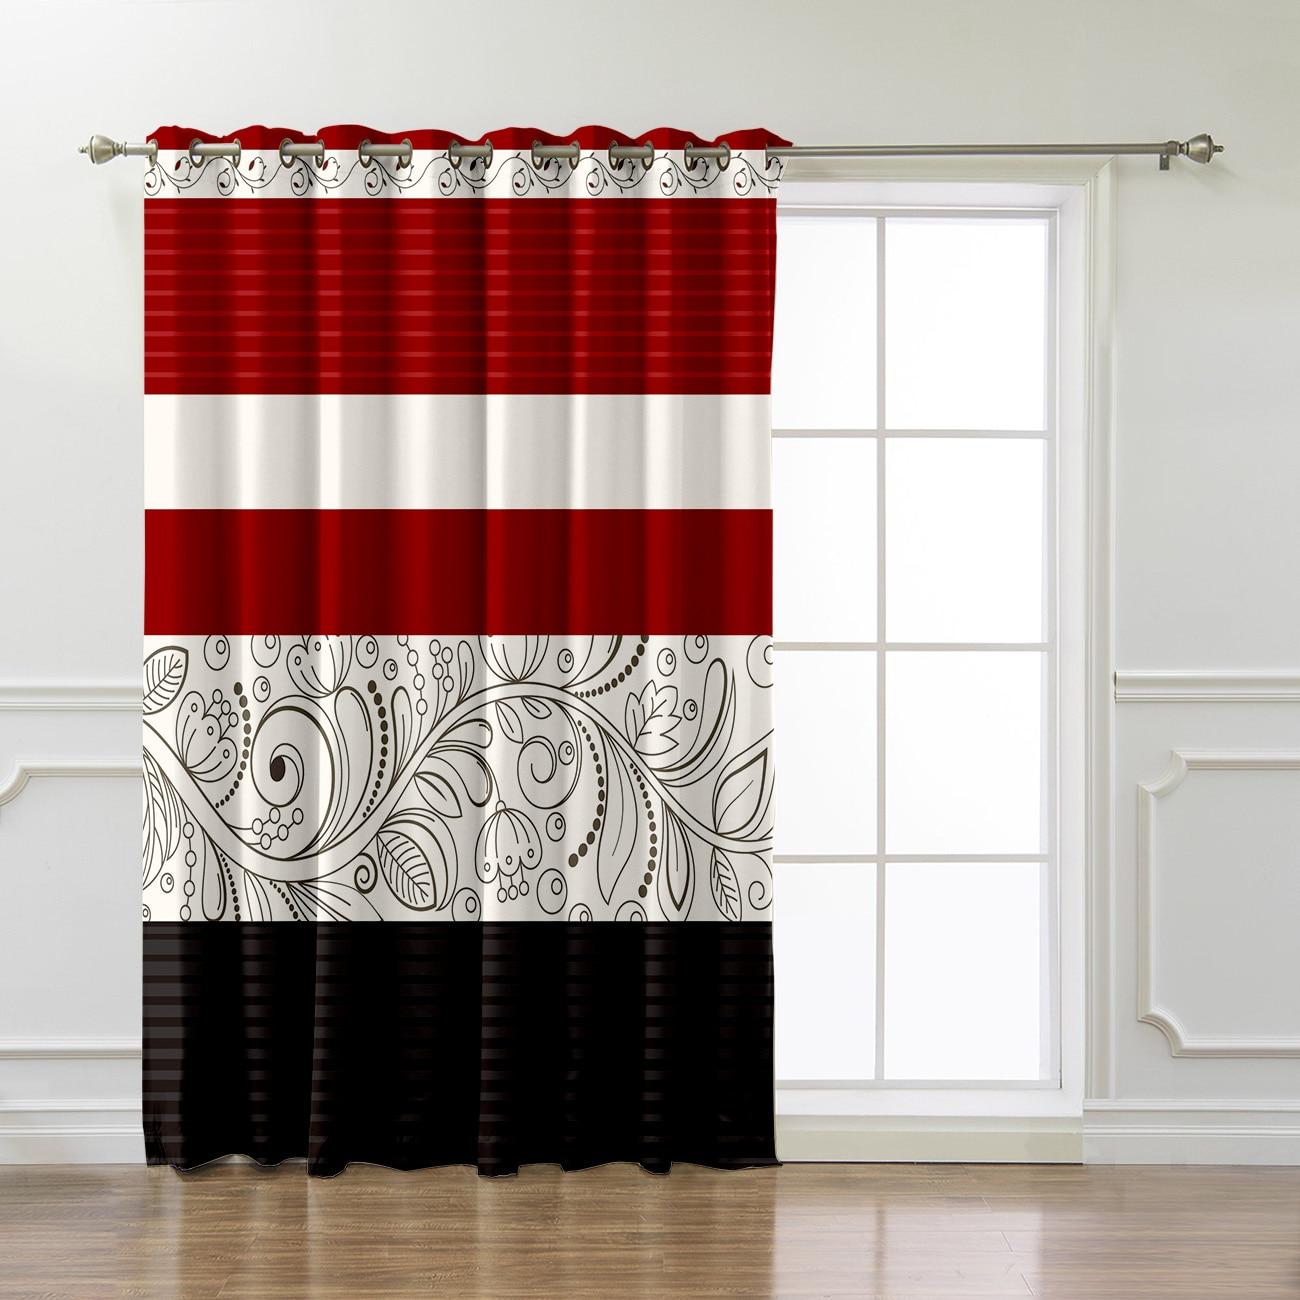 Room Curtains Large Window Curtain Rod